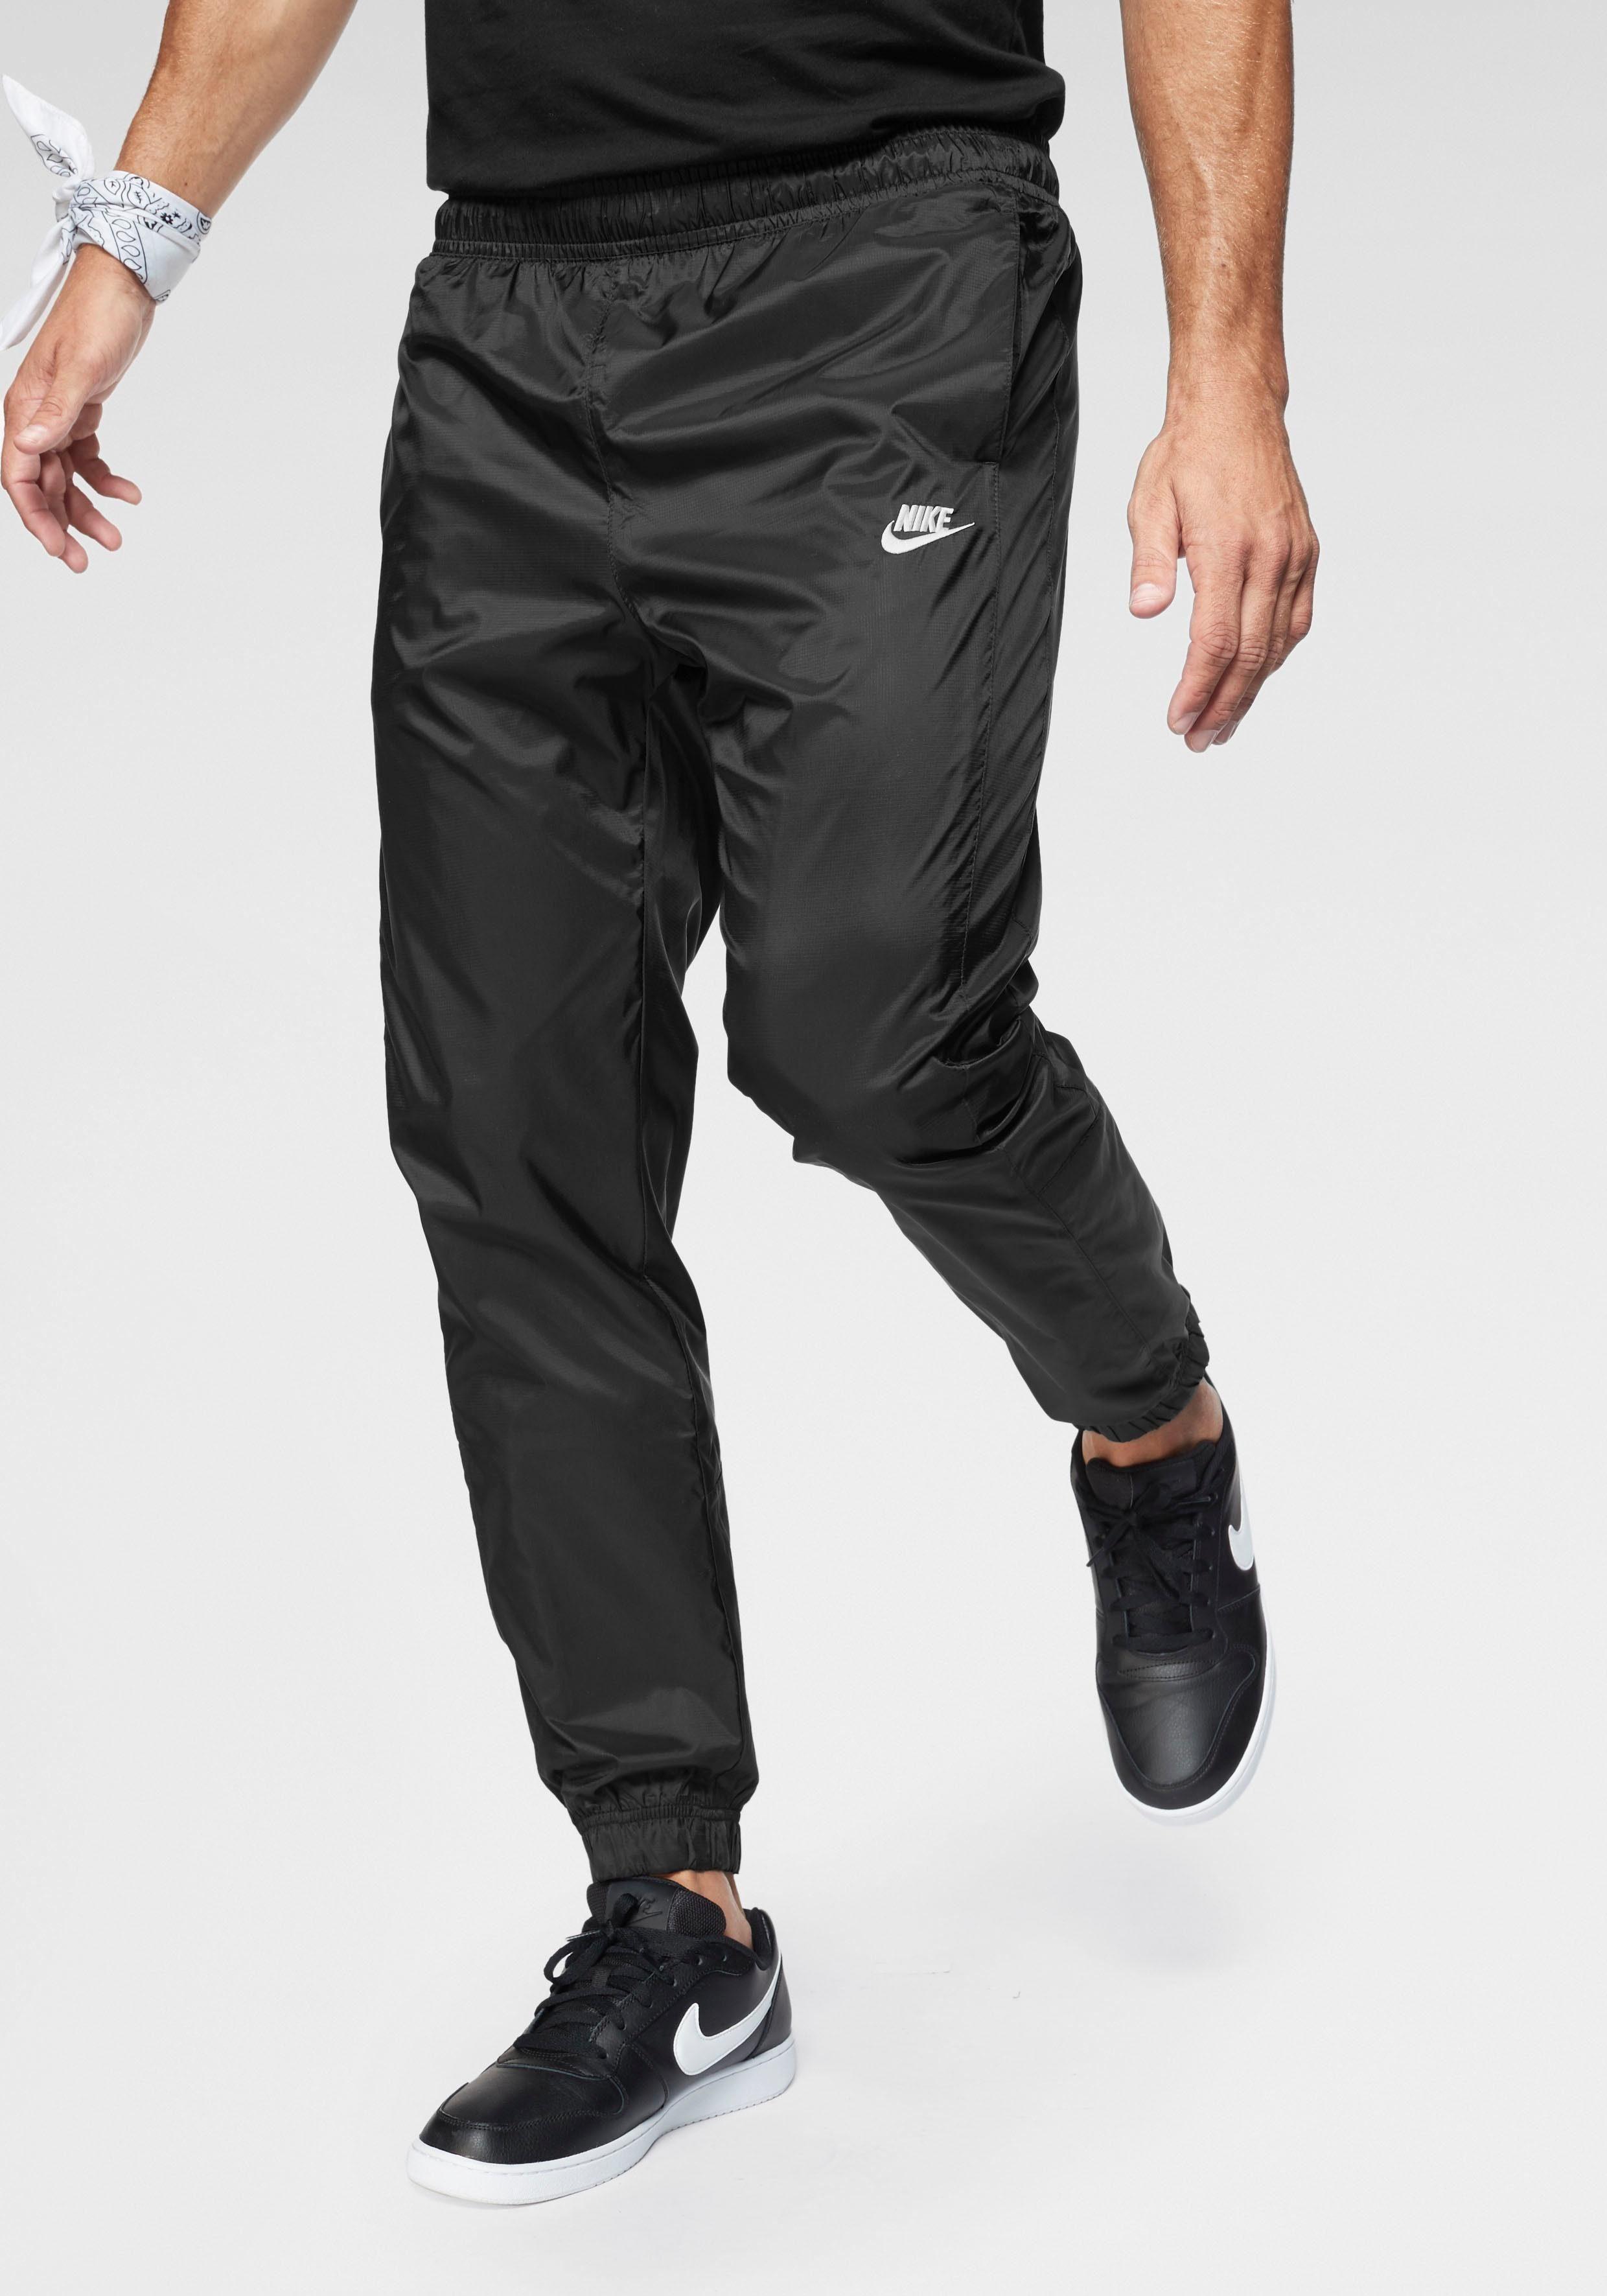 Nike Sportswear Sporthose »M NSW CE PANT CF WVN CORE TRK« online kaufen | OTTO